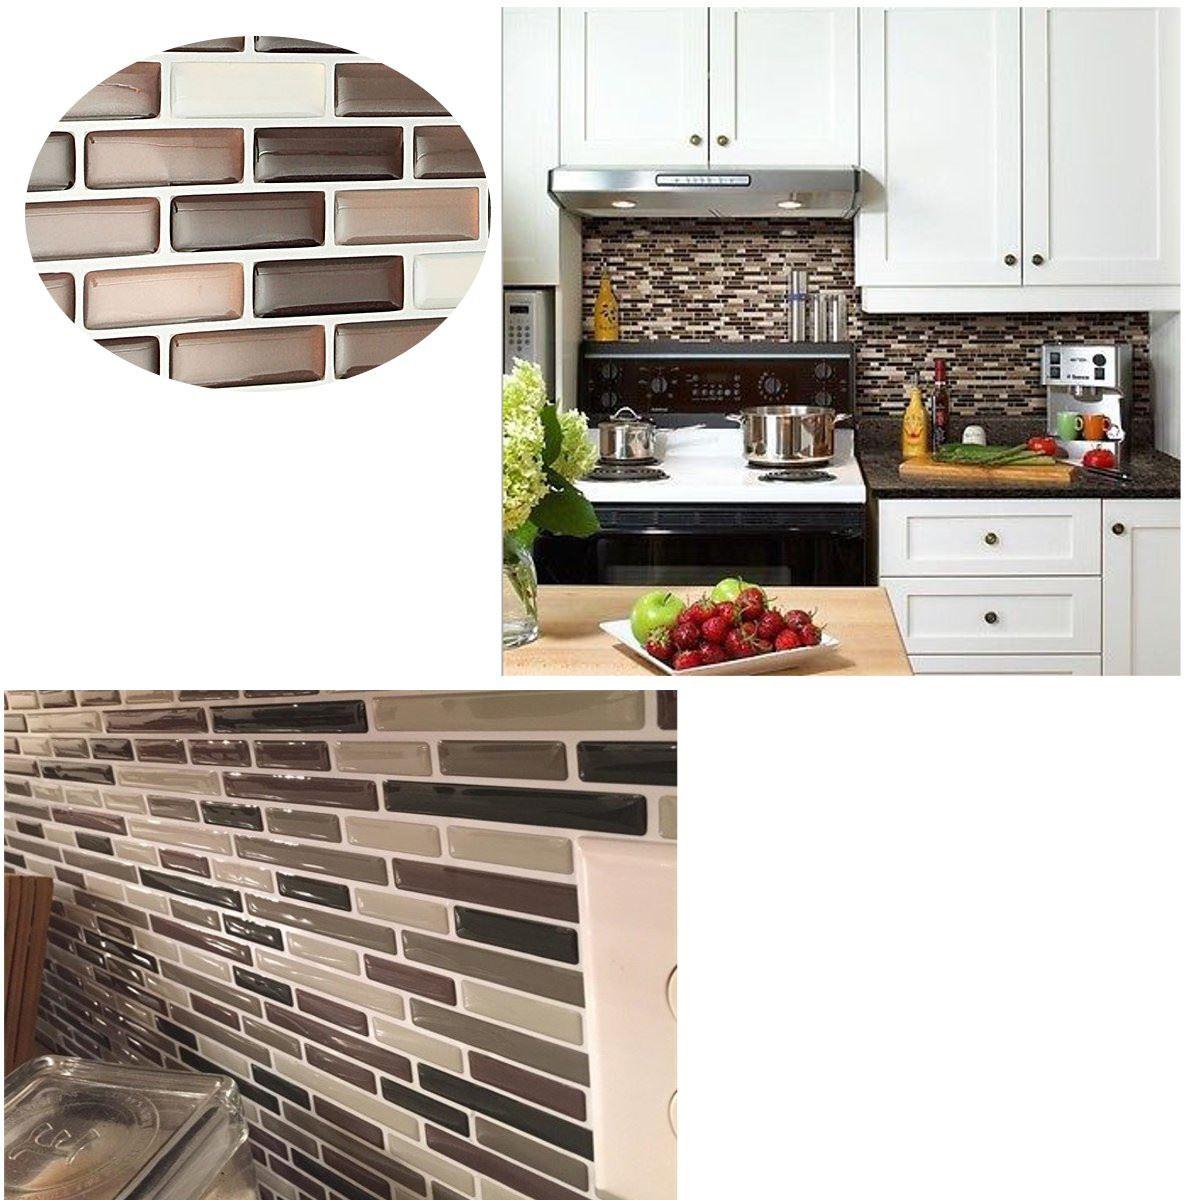 Red Brick Tiles Kitchen Popular Red Brick Tile Flooring Buy Cheap Red Brick Tile Flooring